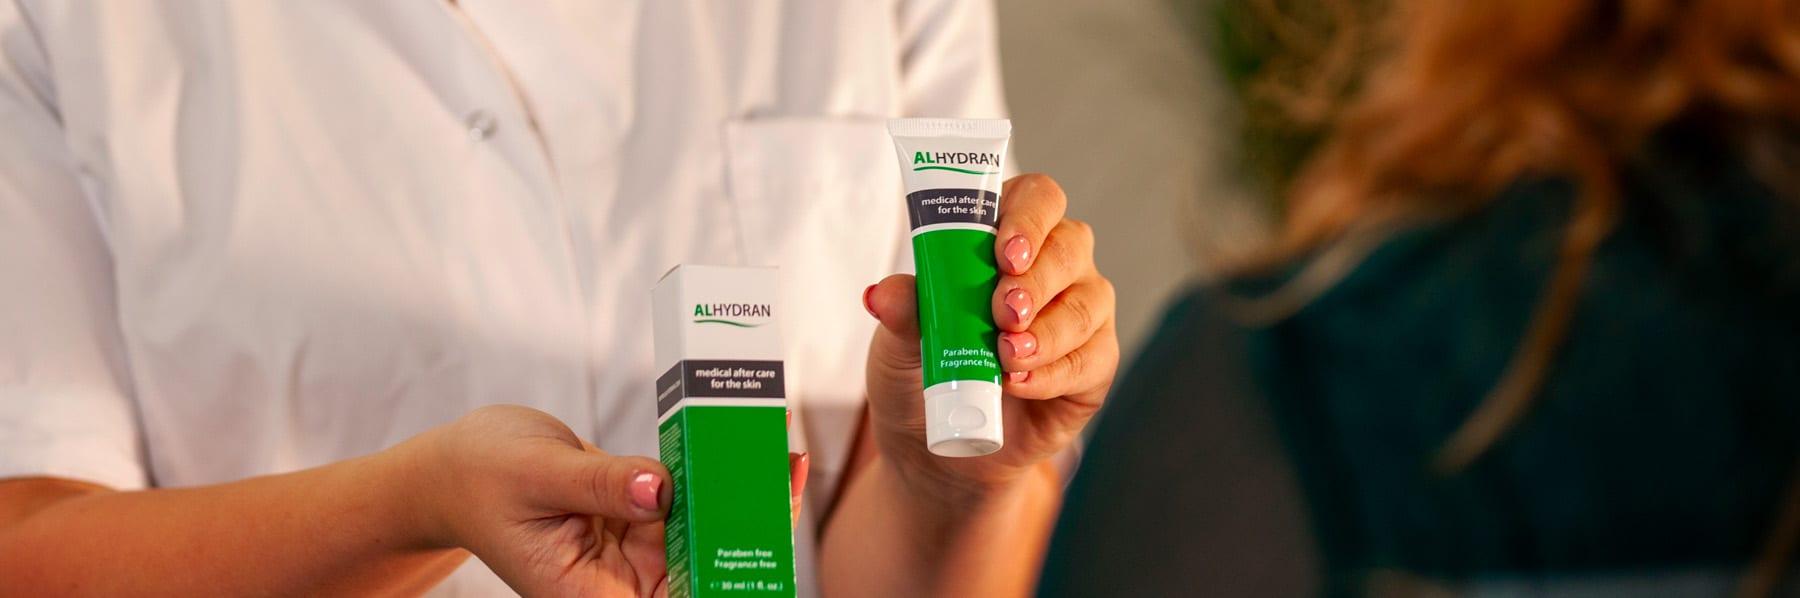 ALHYDRAN merk header BAP Medicalkopie